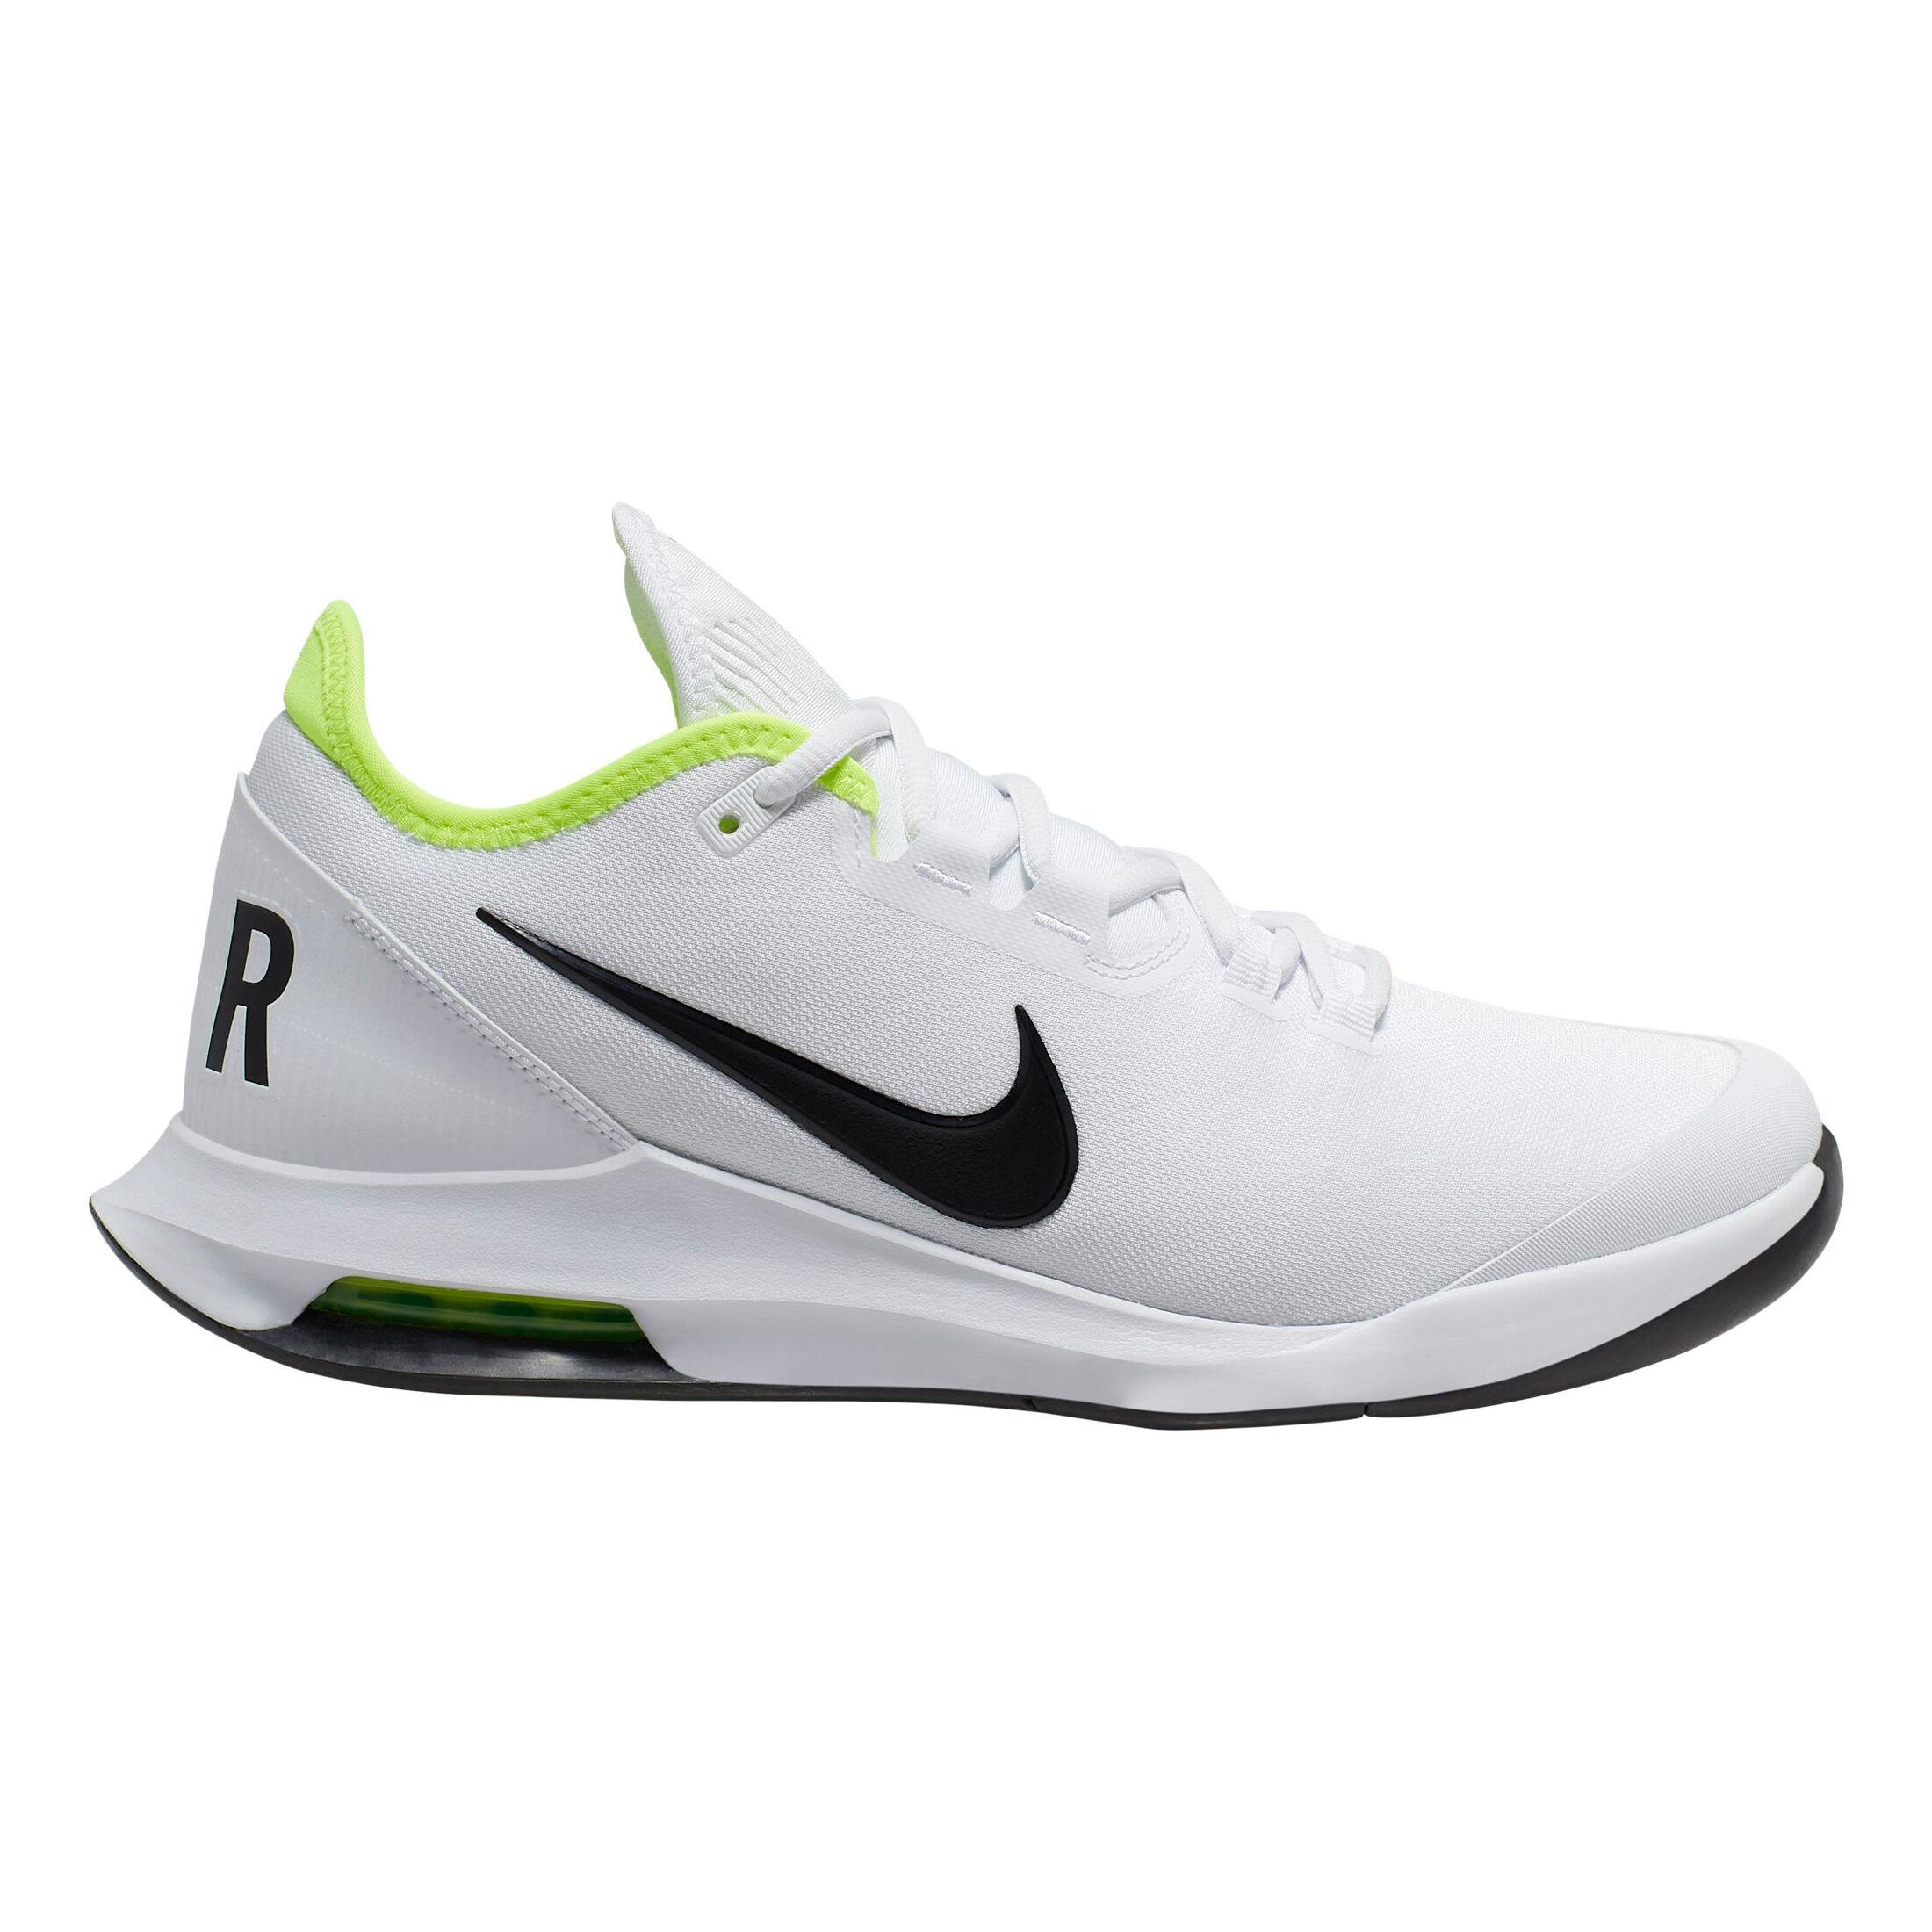 Nike Air Max Wildcard Allcourt Schoen Heren Wit, Neongroen